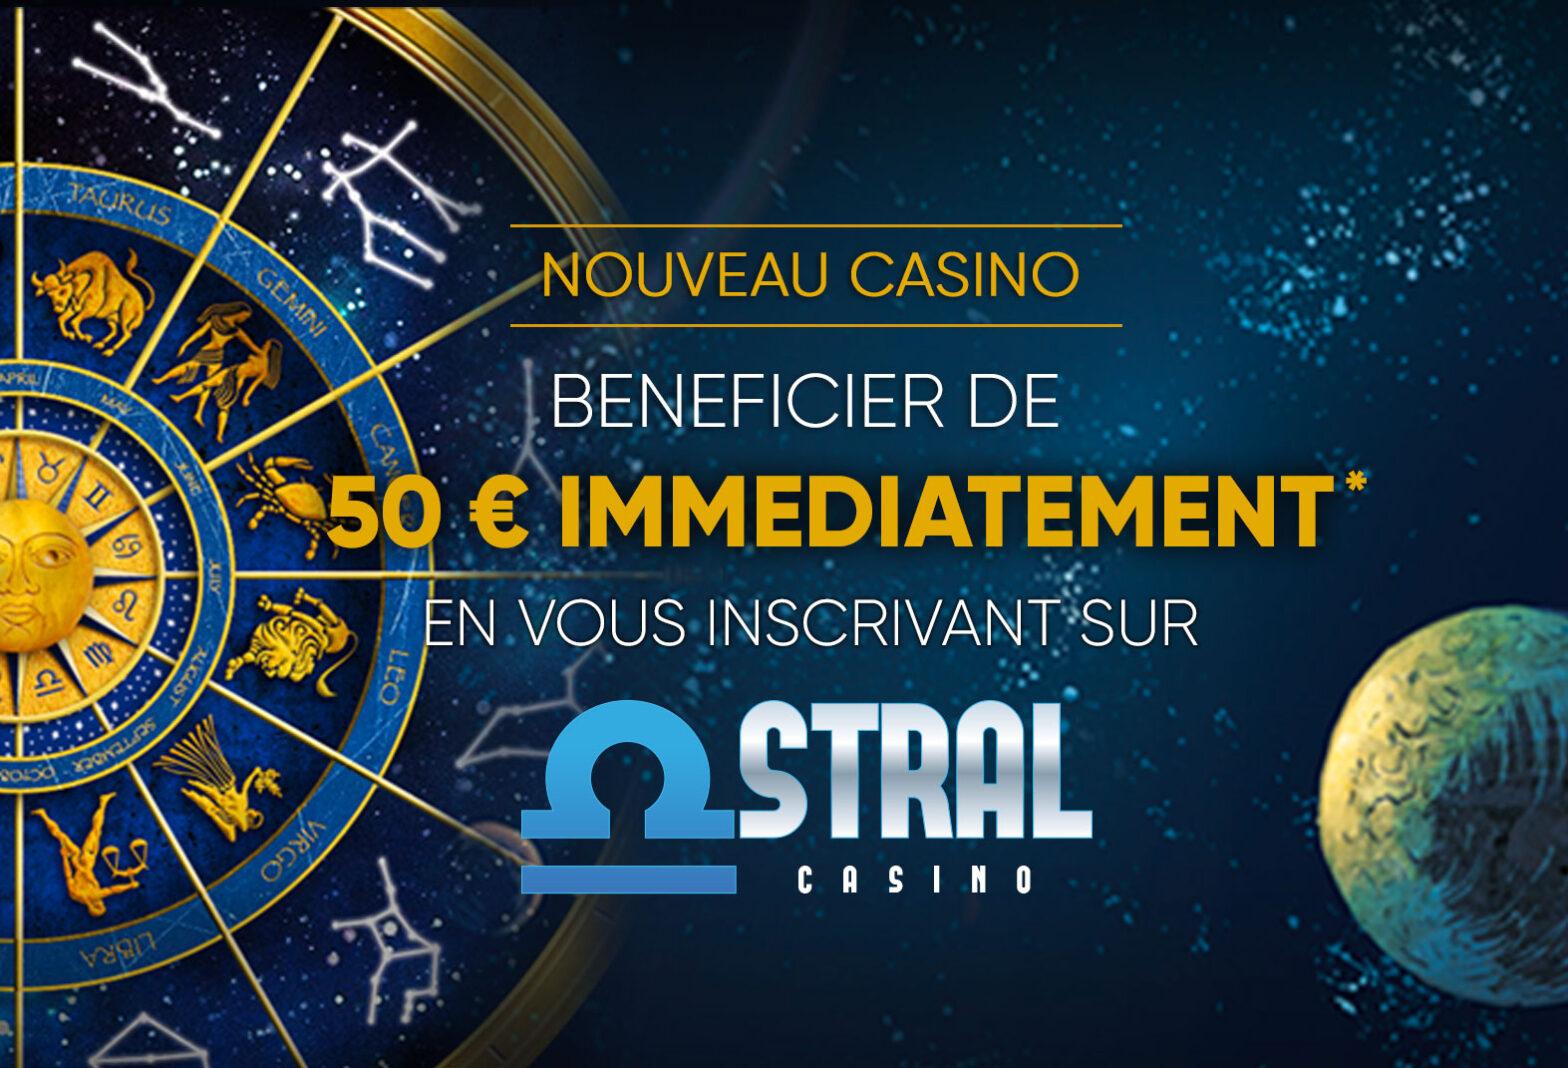 casino astral en ligne